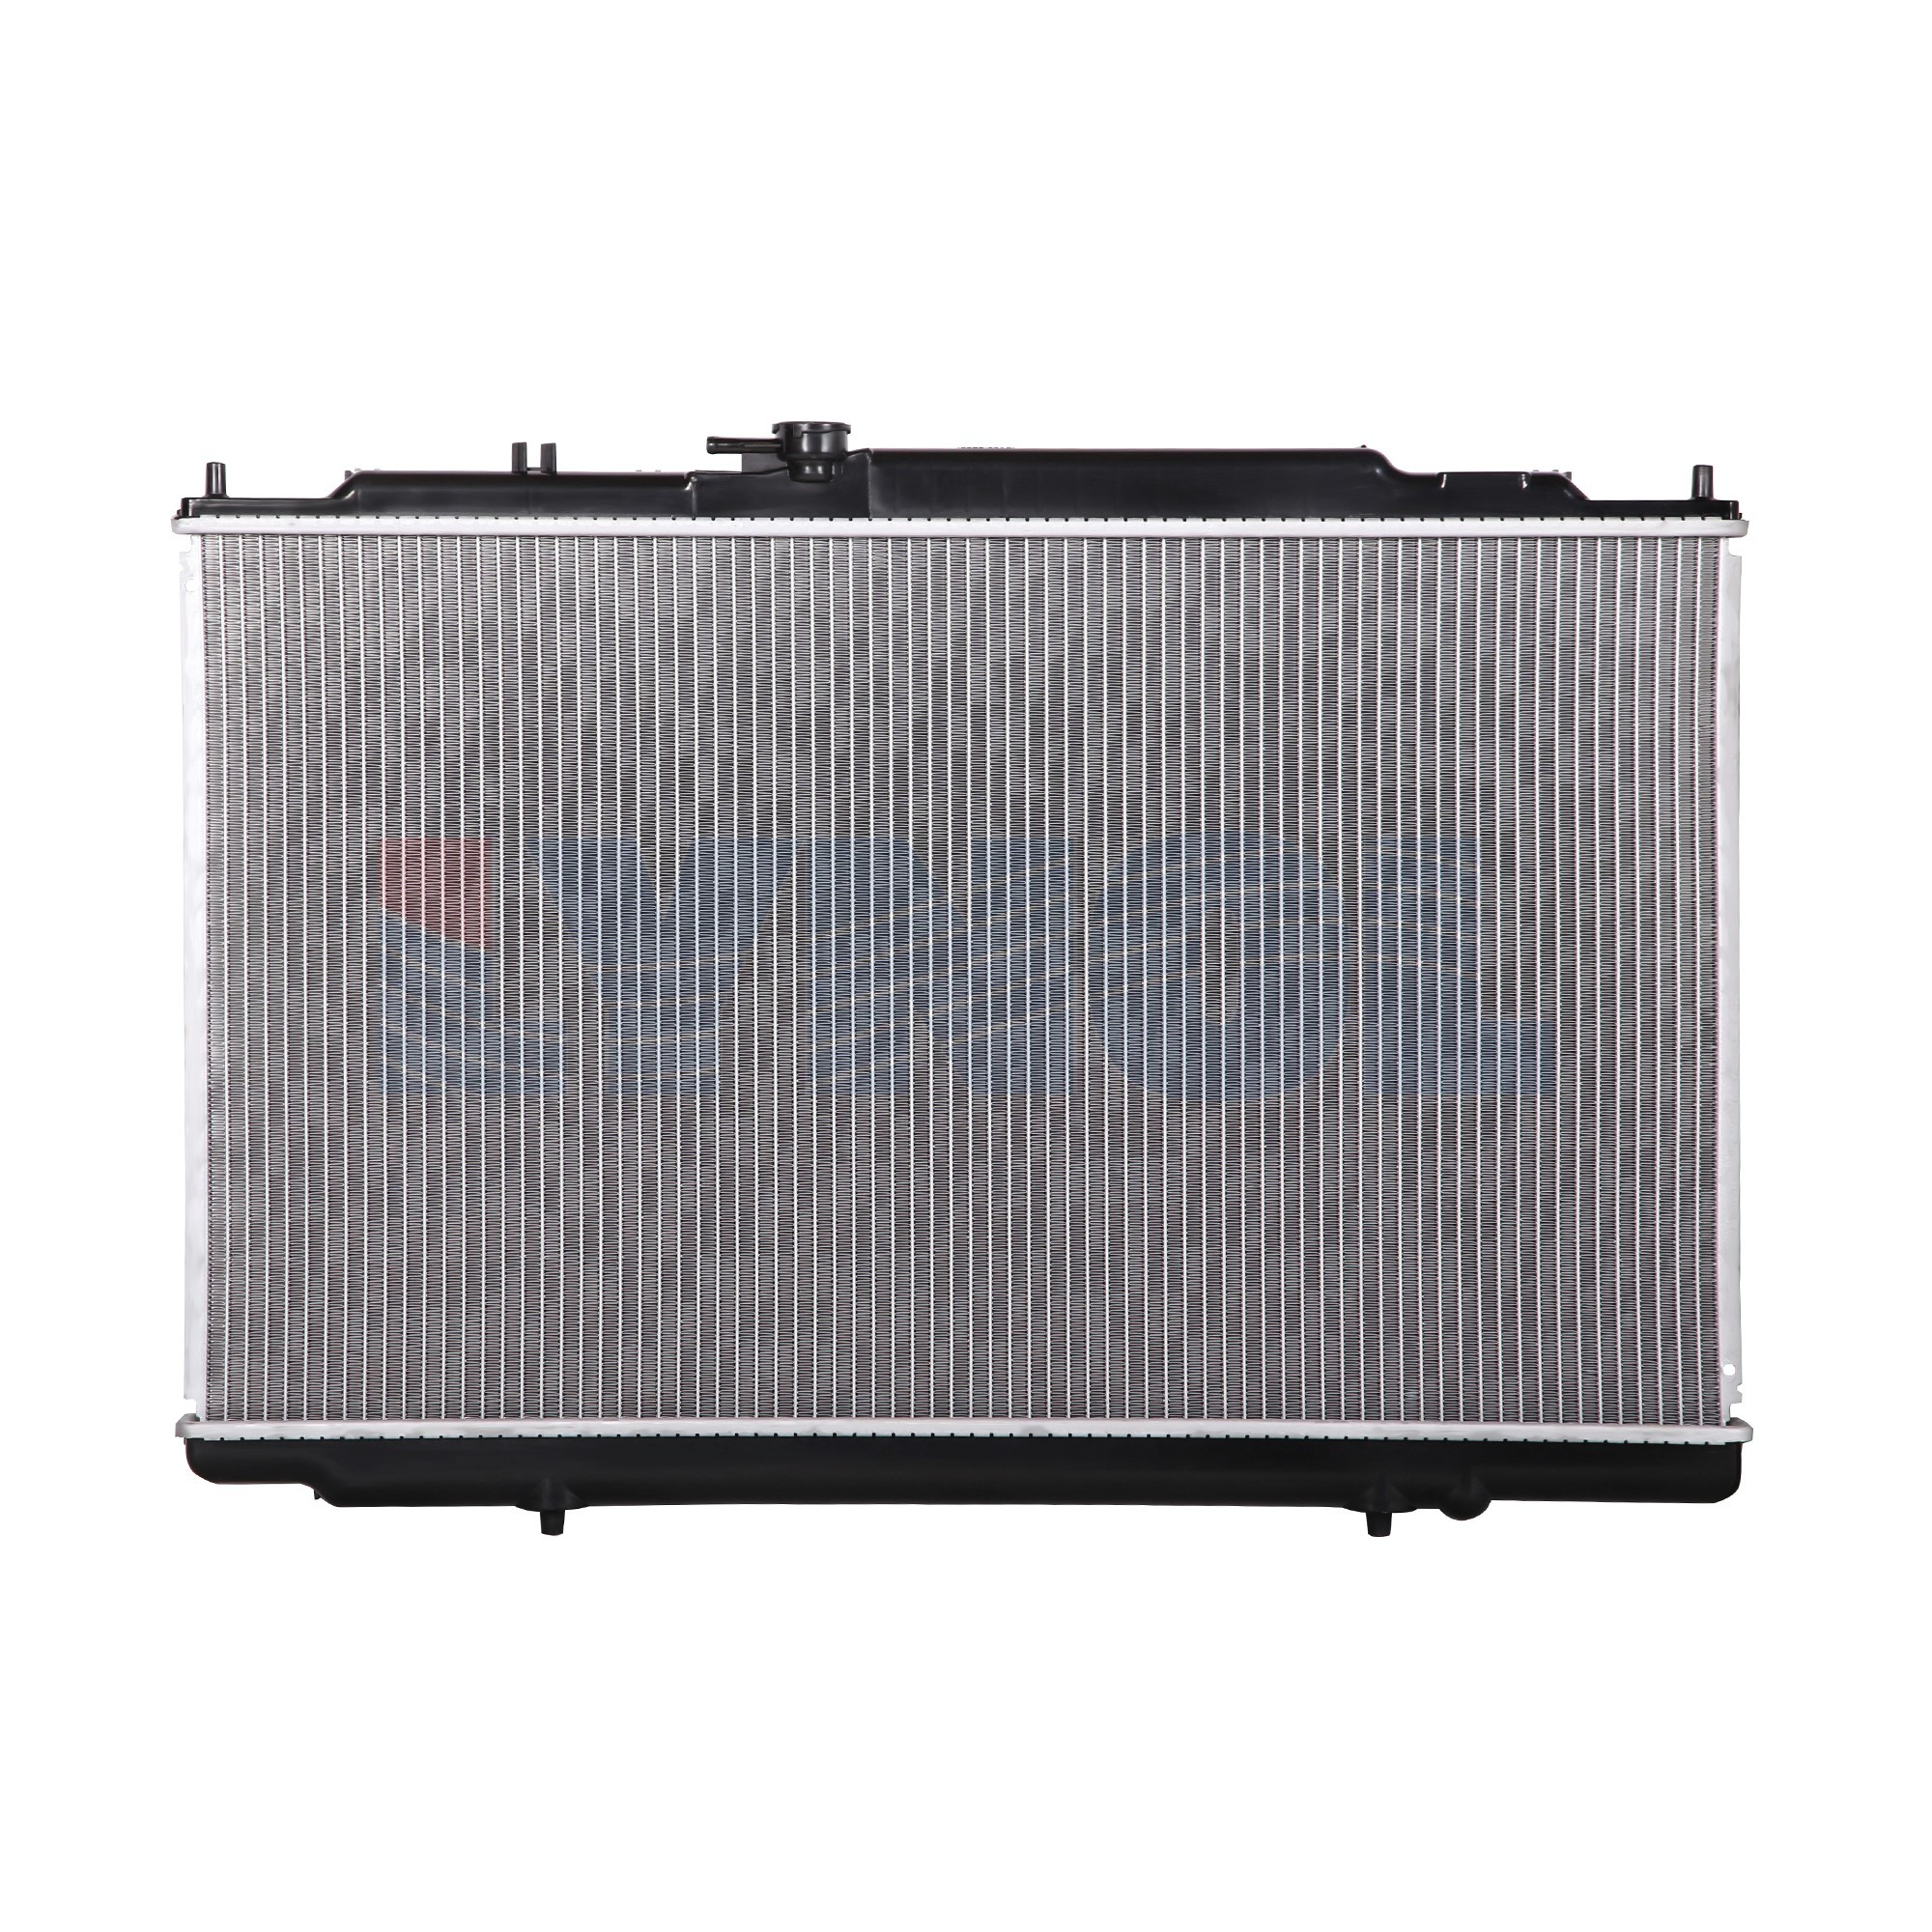 Lynol Truck Parts > Automotive Radiator > LR2270